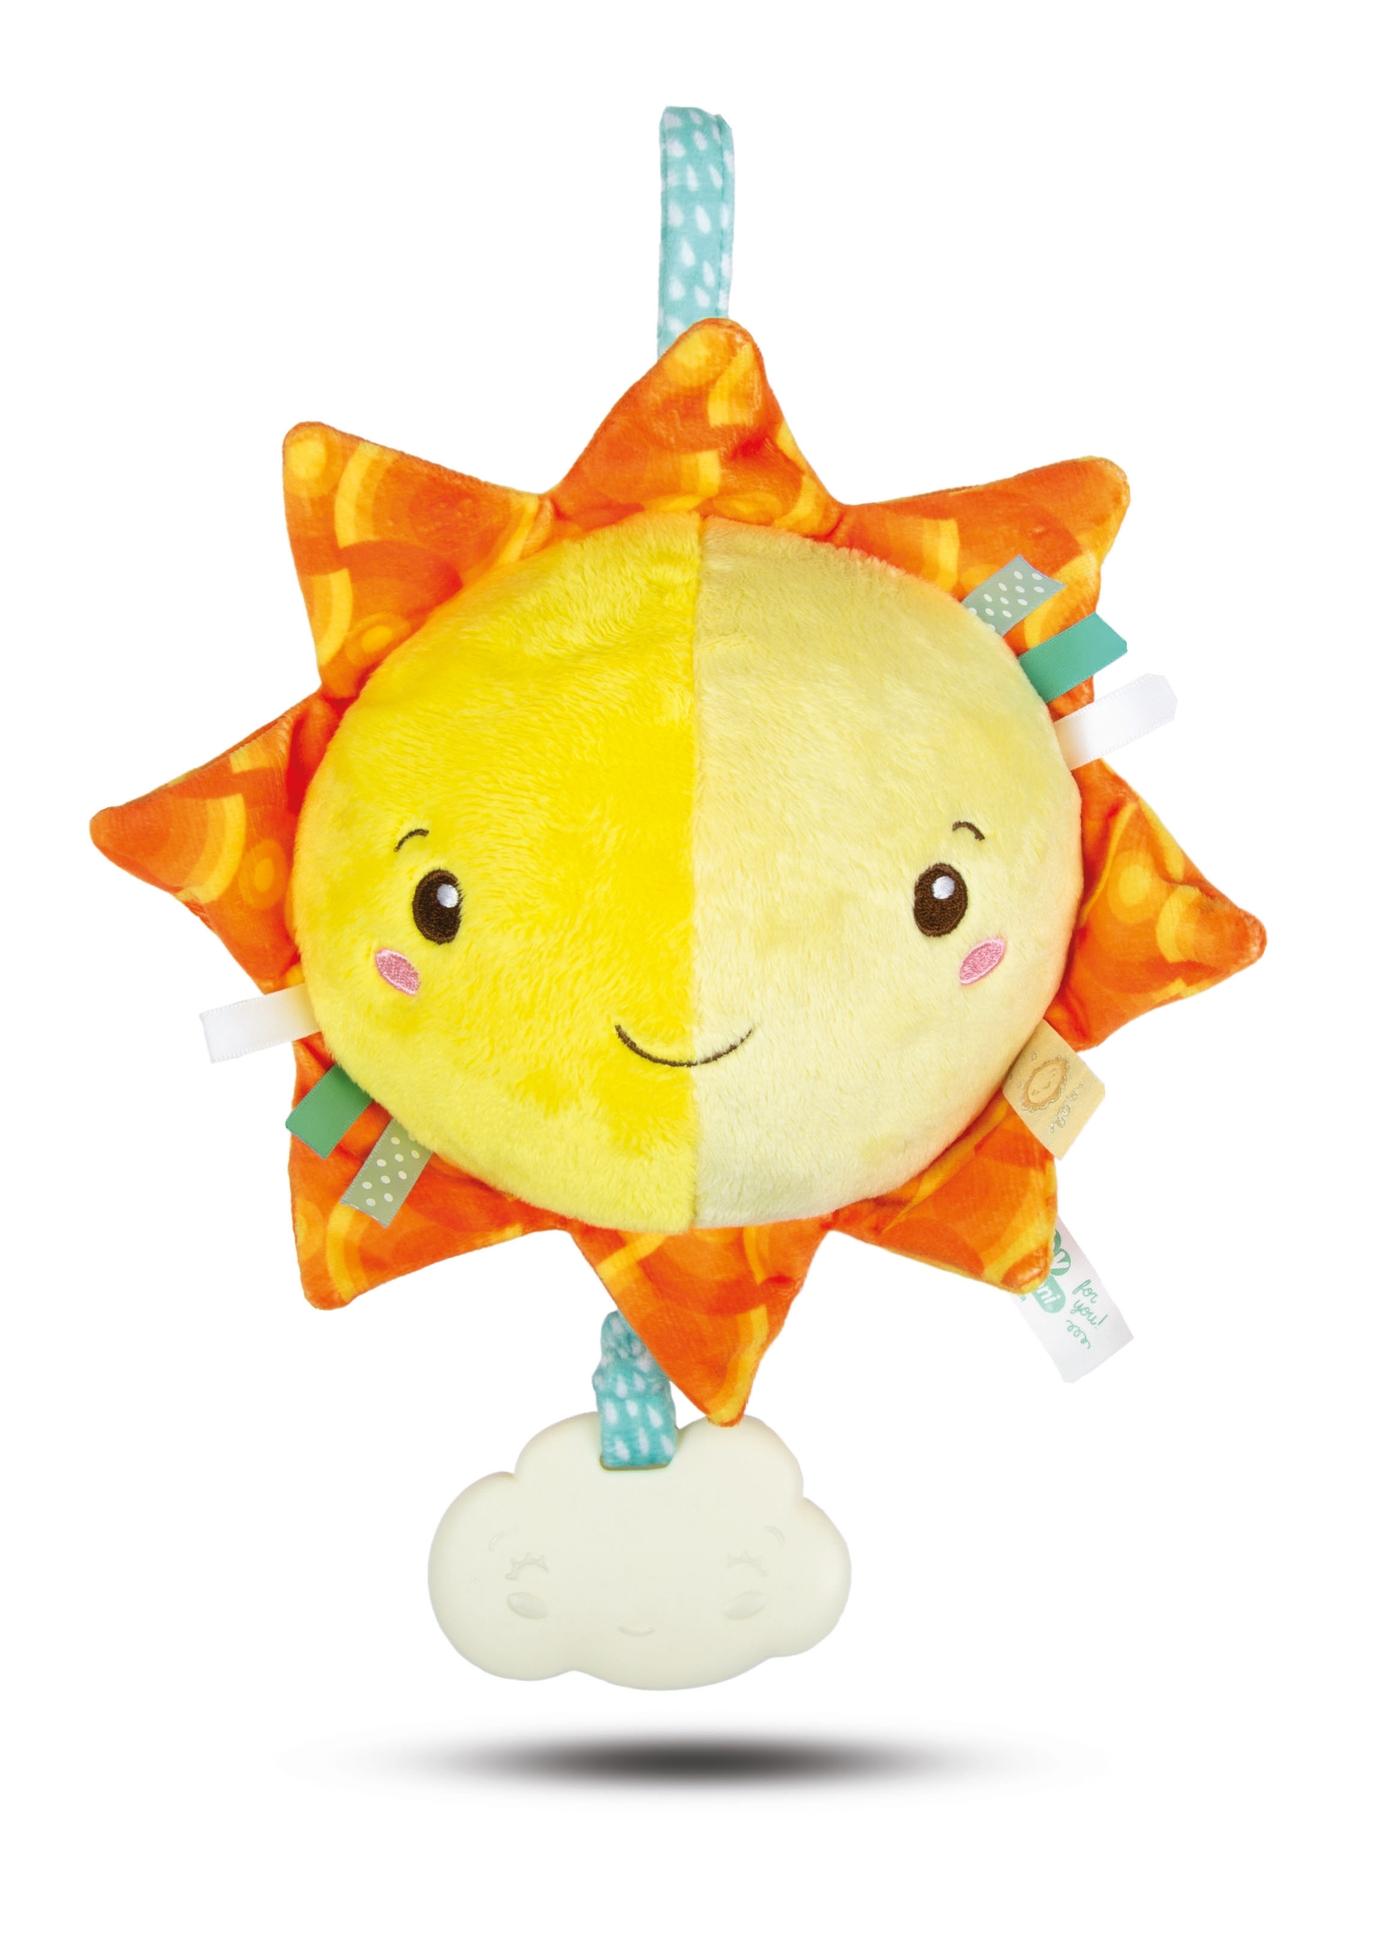 Clementoni - 17270 - soft sun baby clementoni -